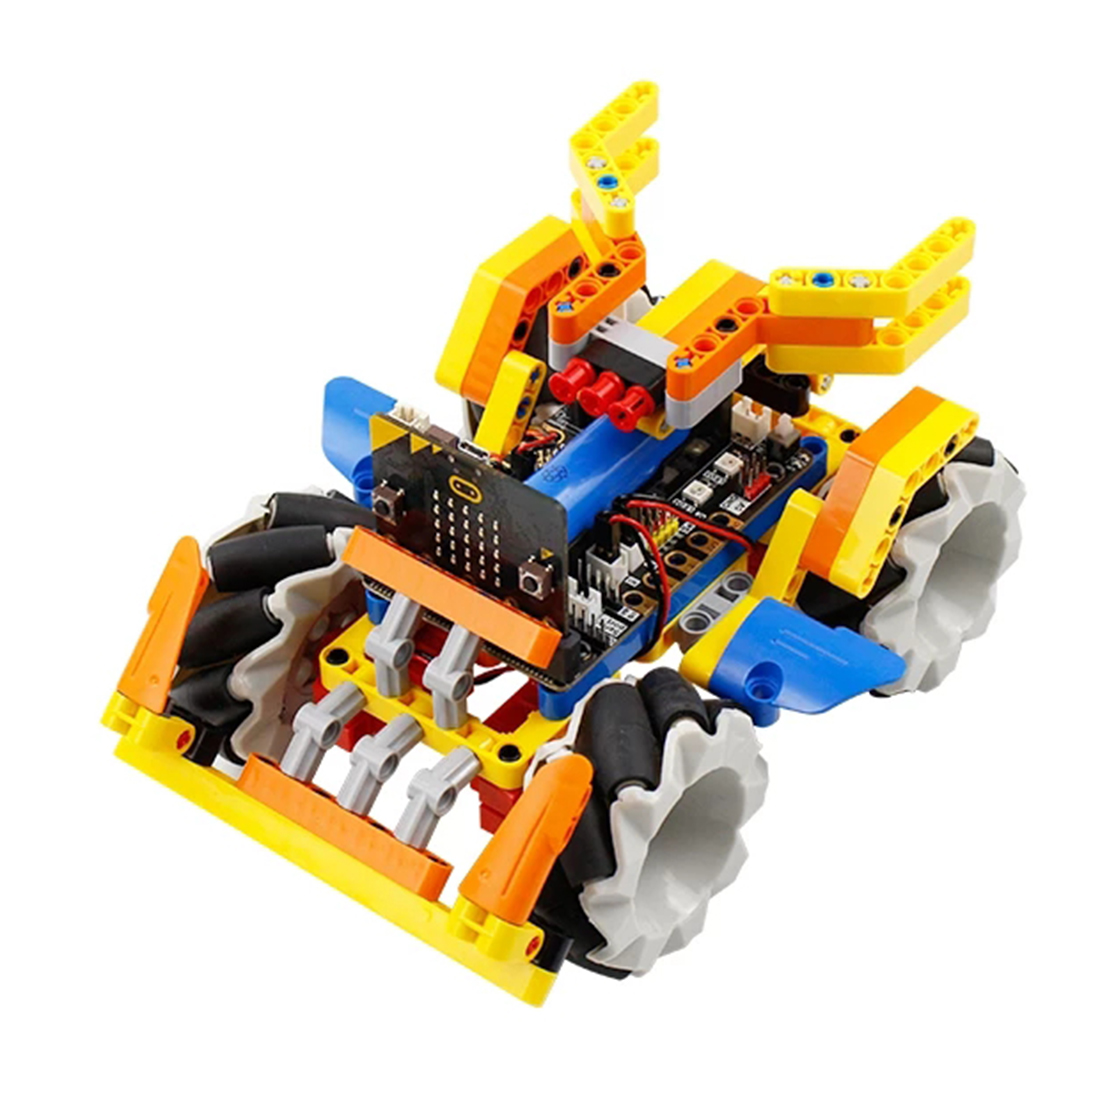 programa robo inteligente bloco de construcao kit 04